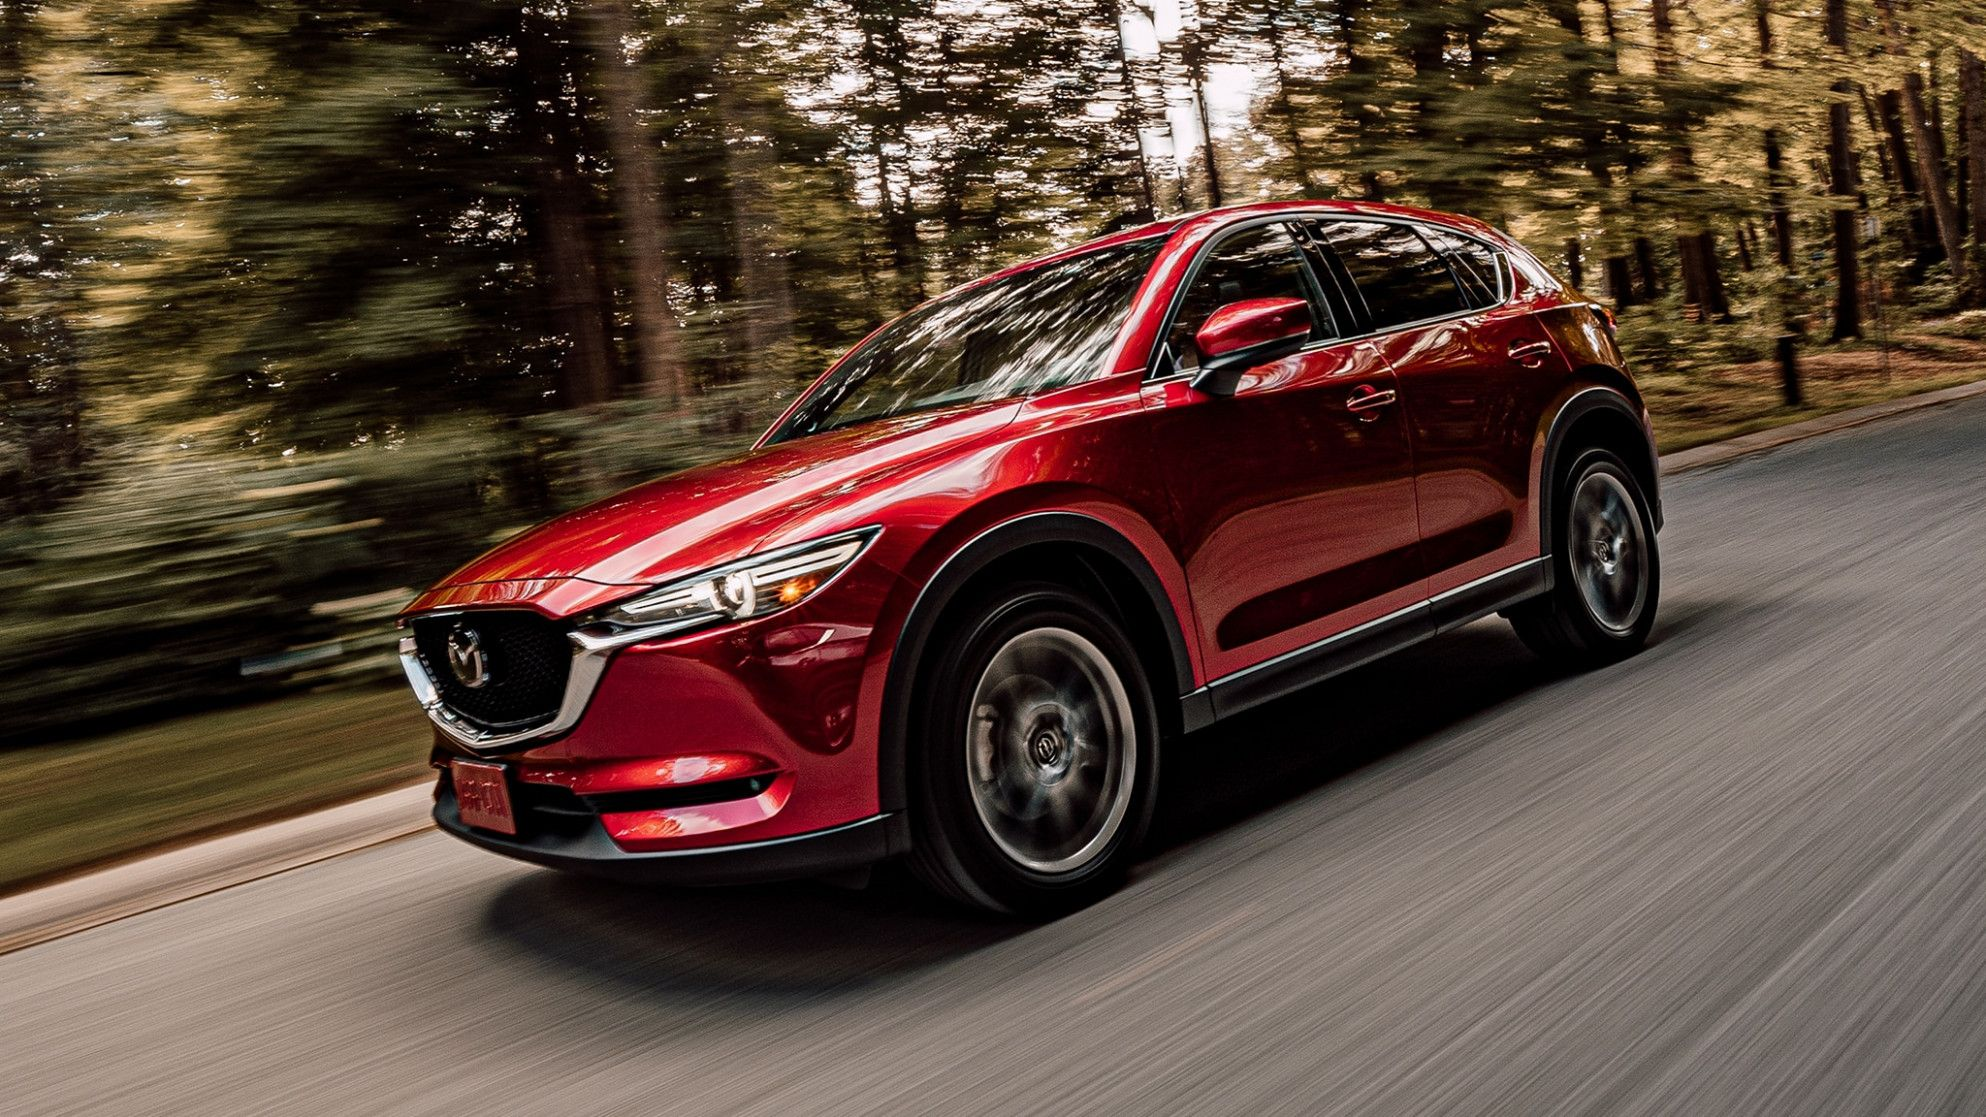 7 Image 2020 Mazda Cx 5 Zero To 60 In 2020 Mazda Cool Sports Cars Car Culture